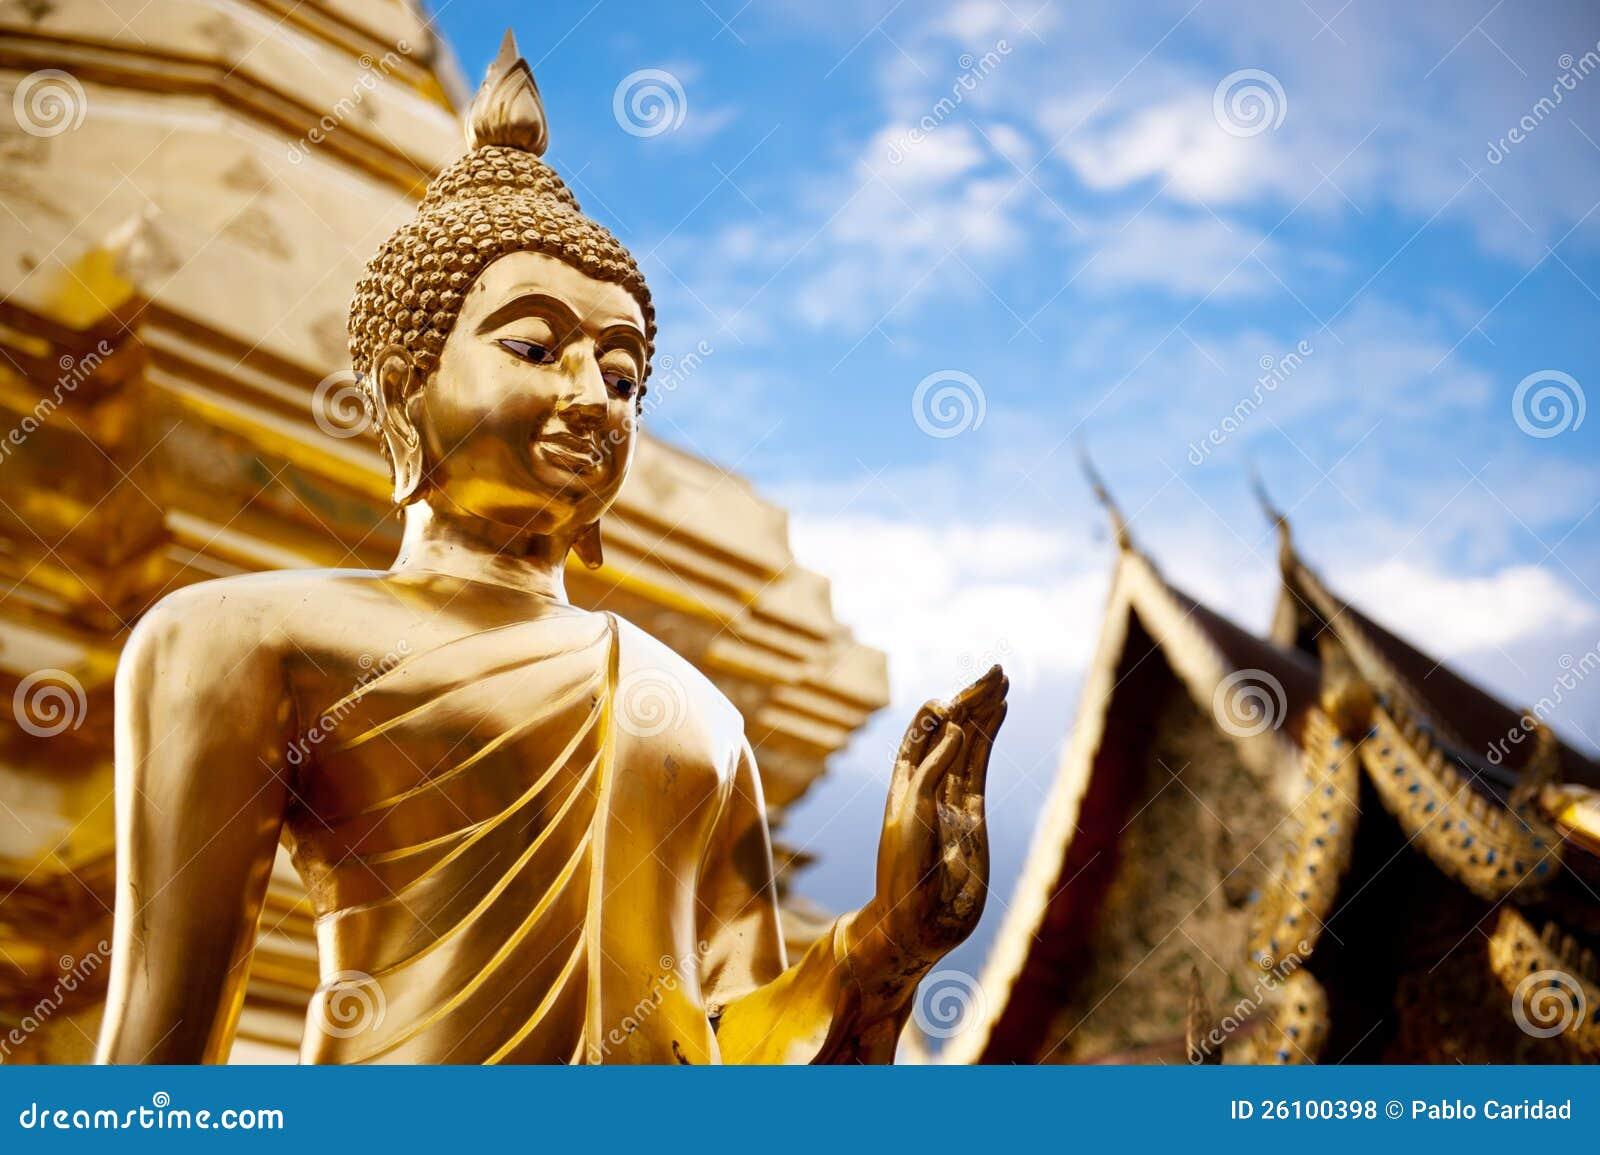 Estatua de oro de Buddha en el templo de Tailandia Buddha.